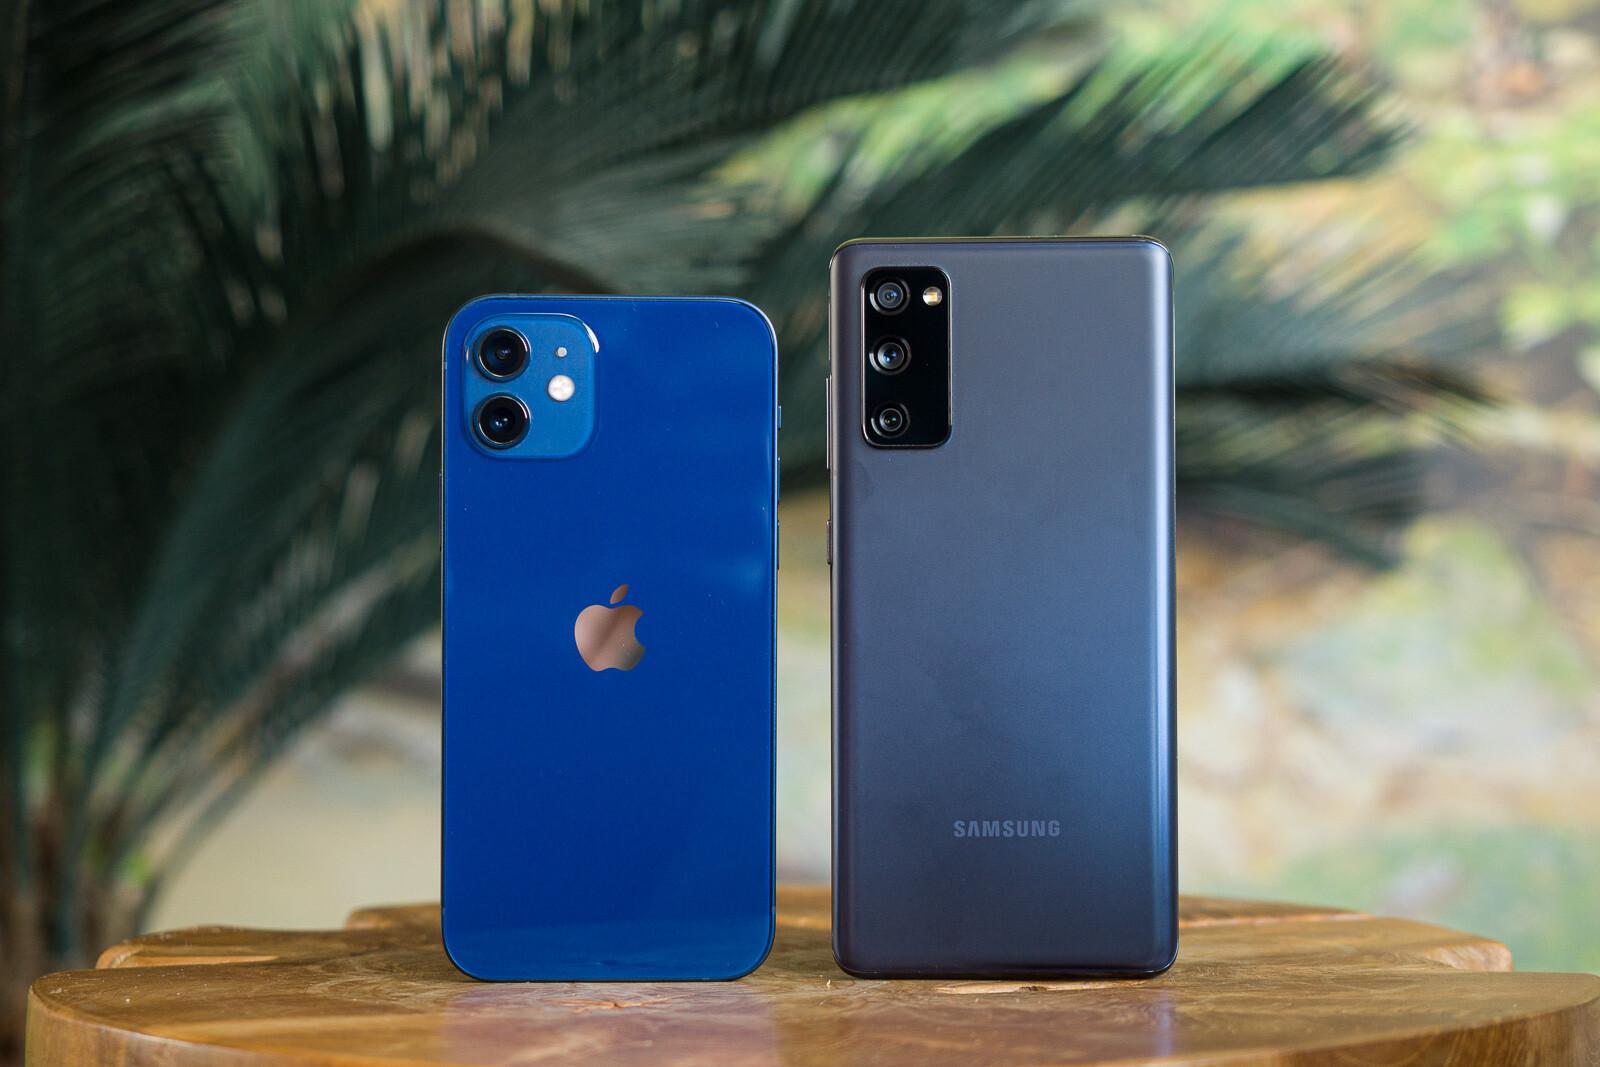 Apple iPhone 12 vs Samsung Galaxy S20 FE